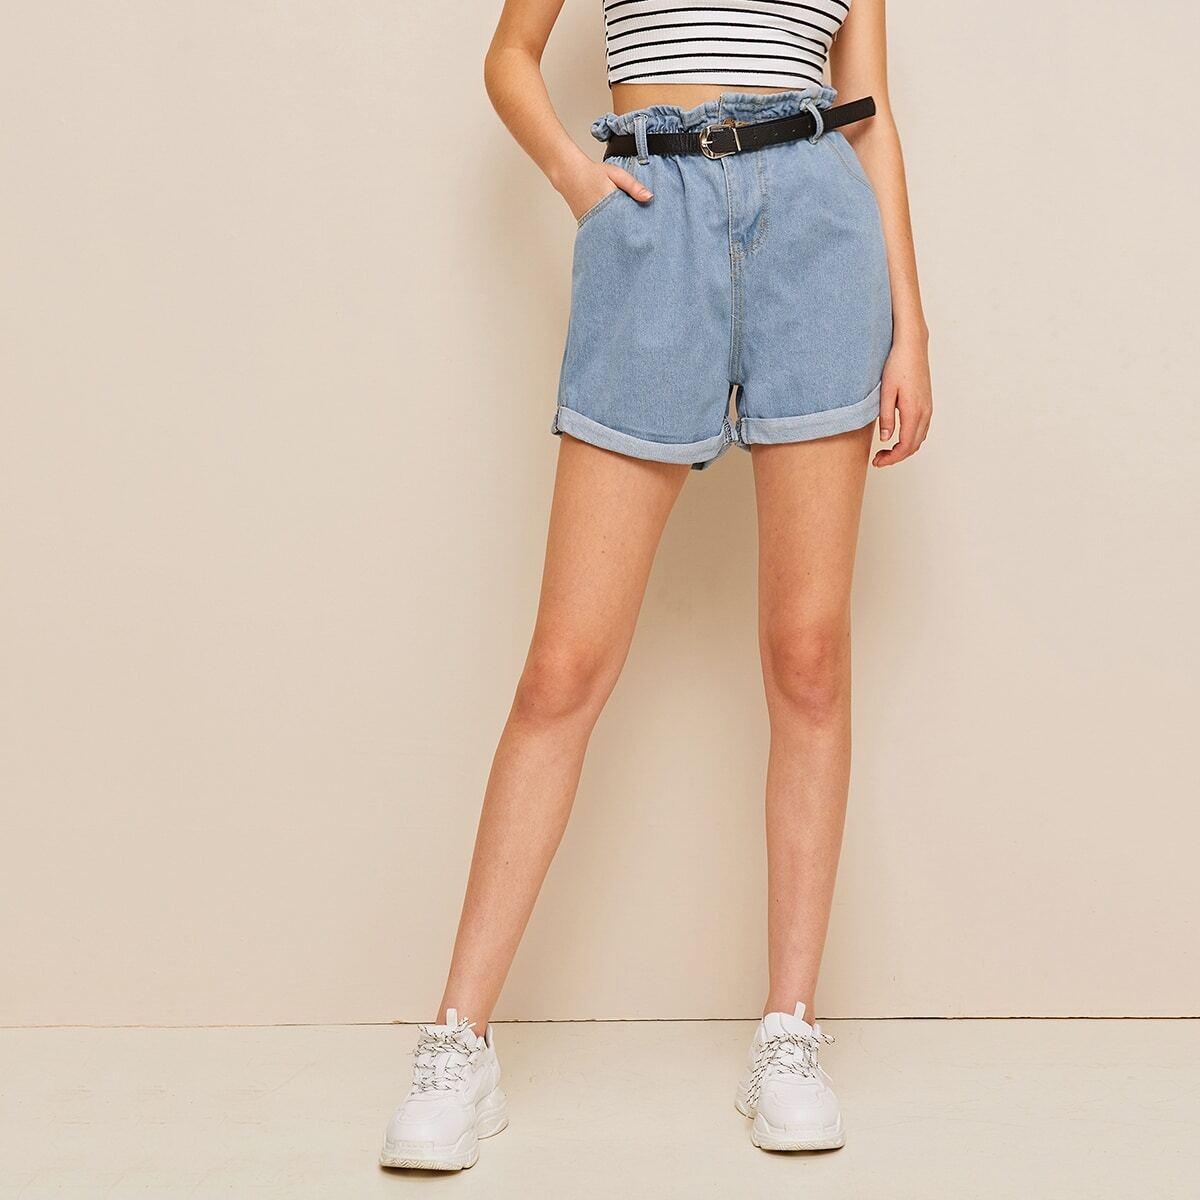 Blauw Casual Vlak Denim shorts Riem